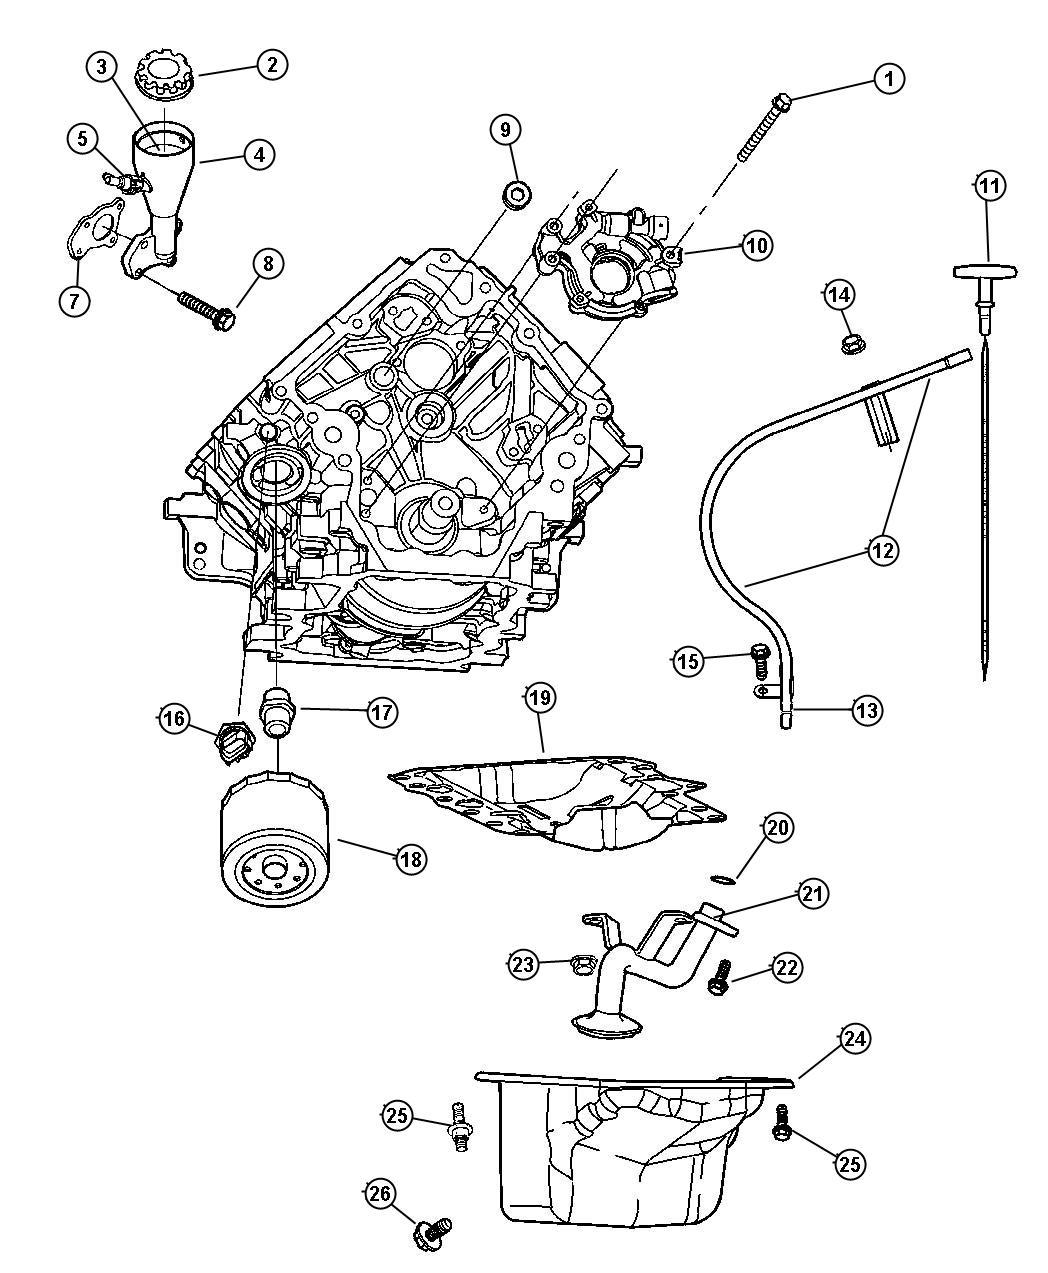 Jeep Liberty Valve Crankcase Vent Evaevd Evaevc